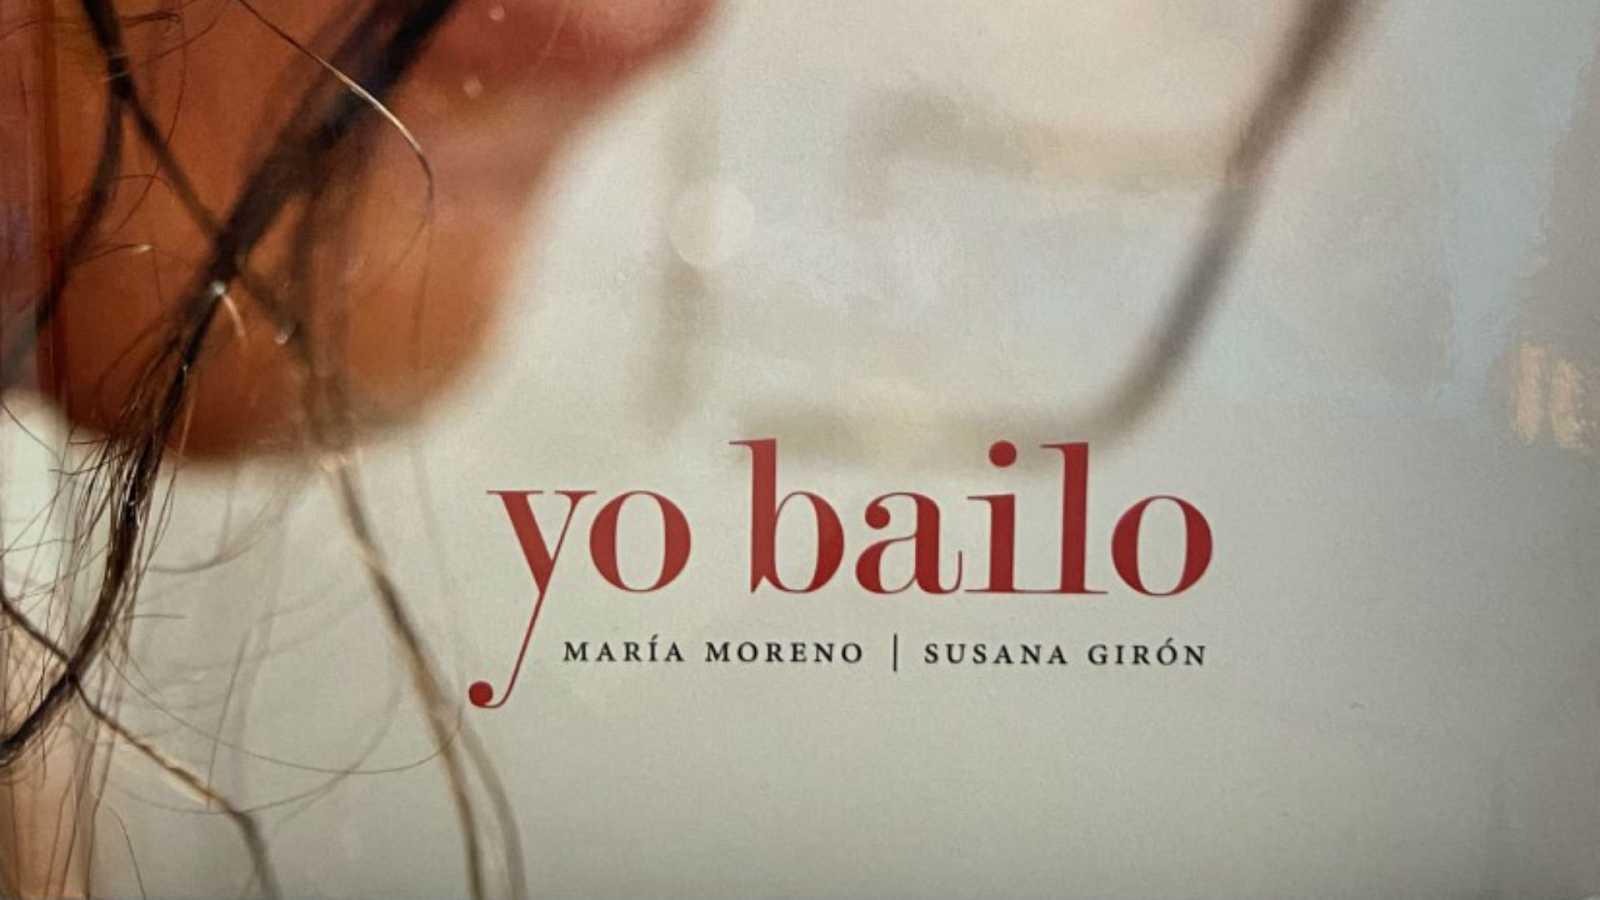 A compás - 'Yo bailo' de María Moreno y Susana Girón - 12/11/20 - escuchar ahora